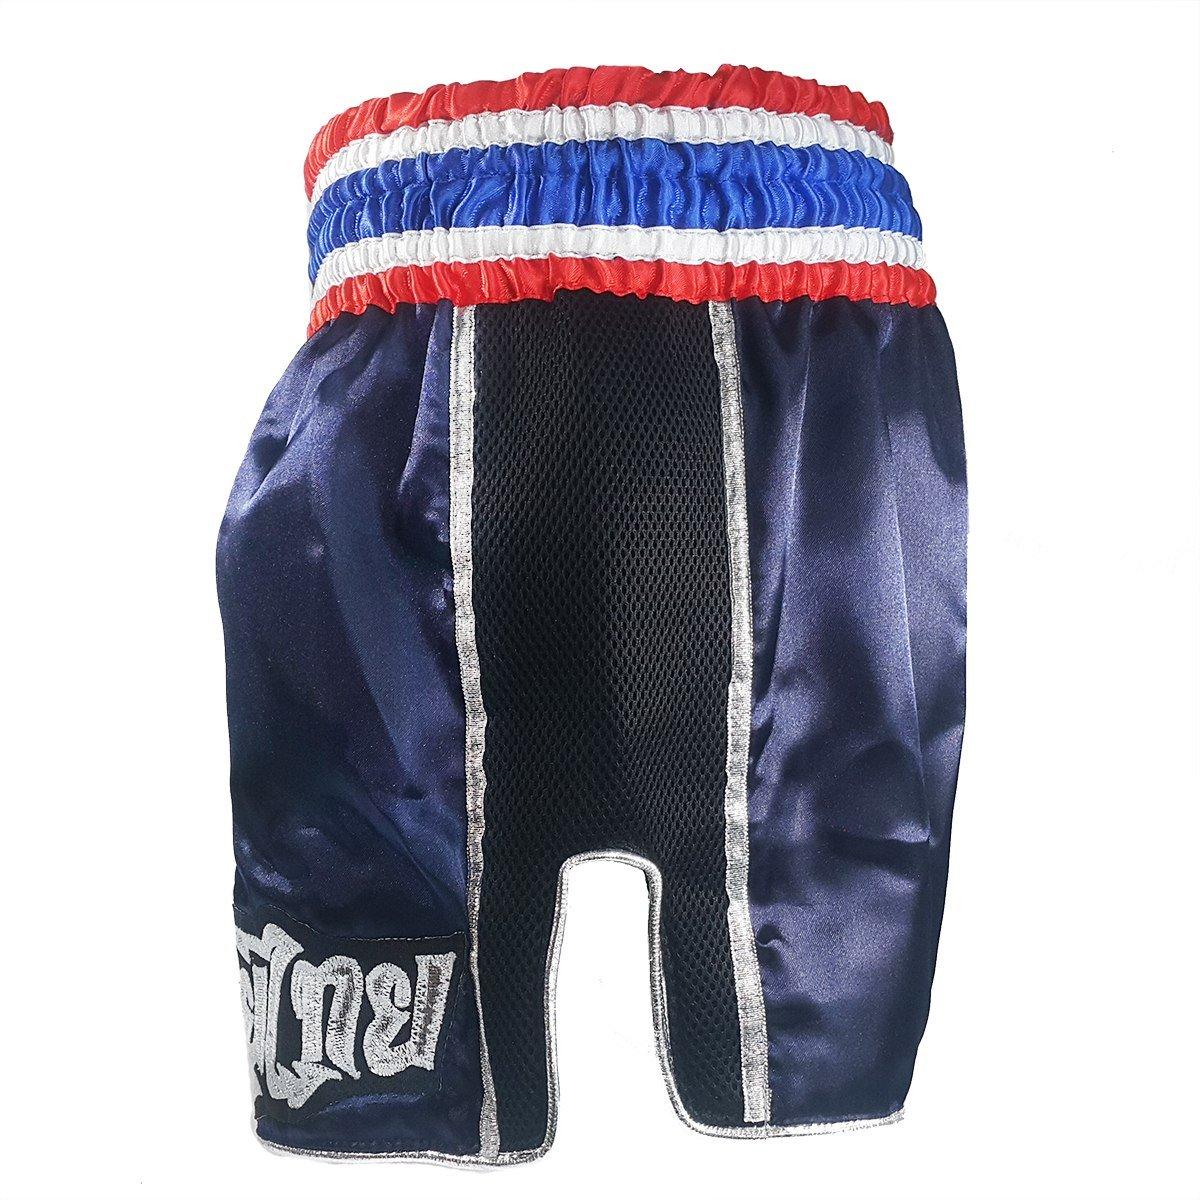 Boxsense Retro Muay thai Boxing Shorts BXSRTO-001-Navy size M